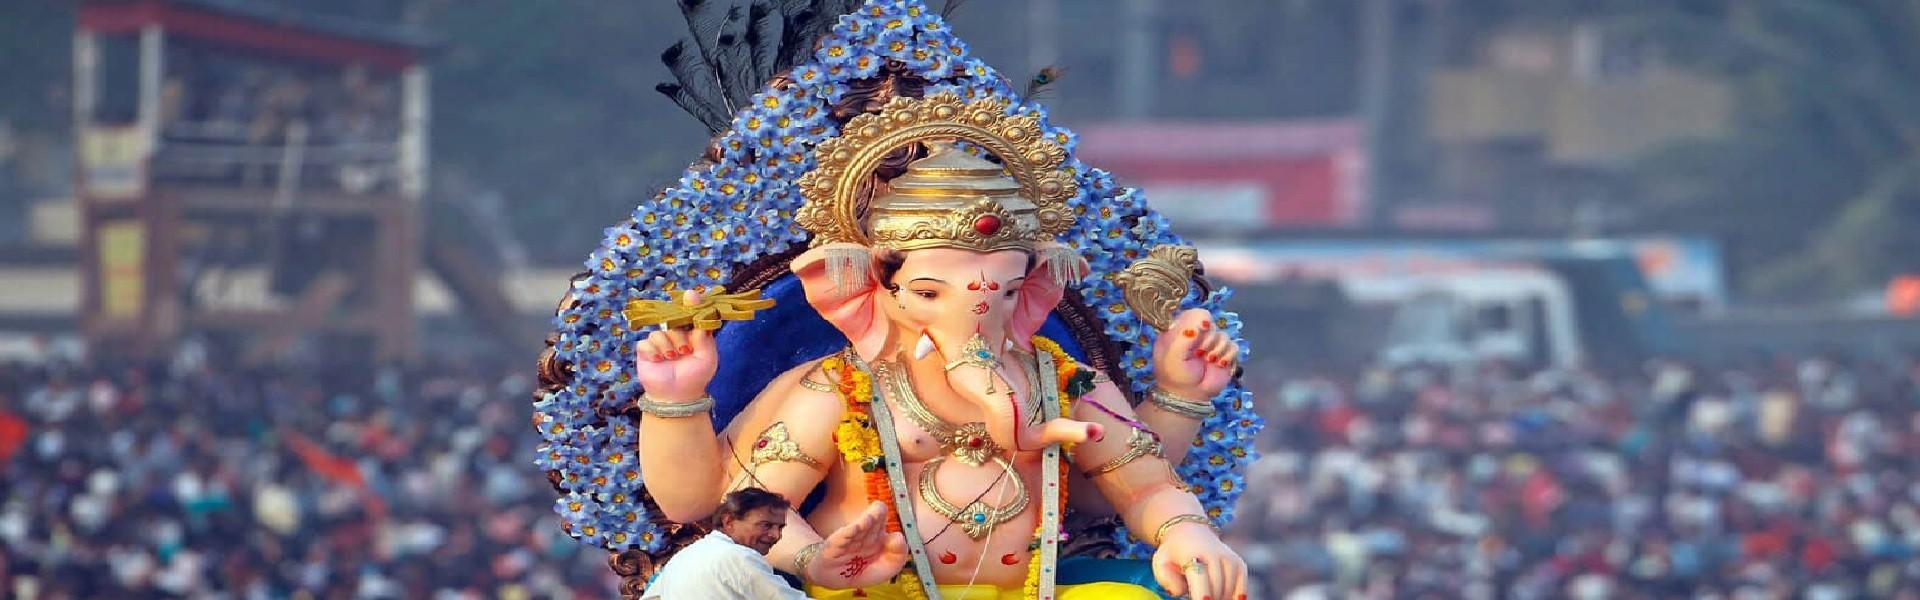 12 Spectacular Festivals in September in India